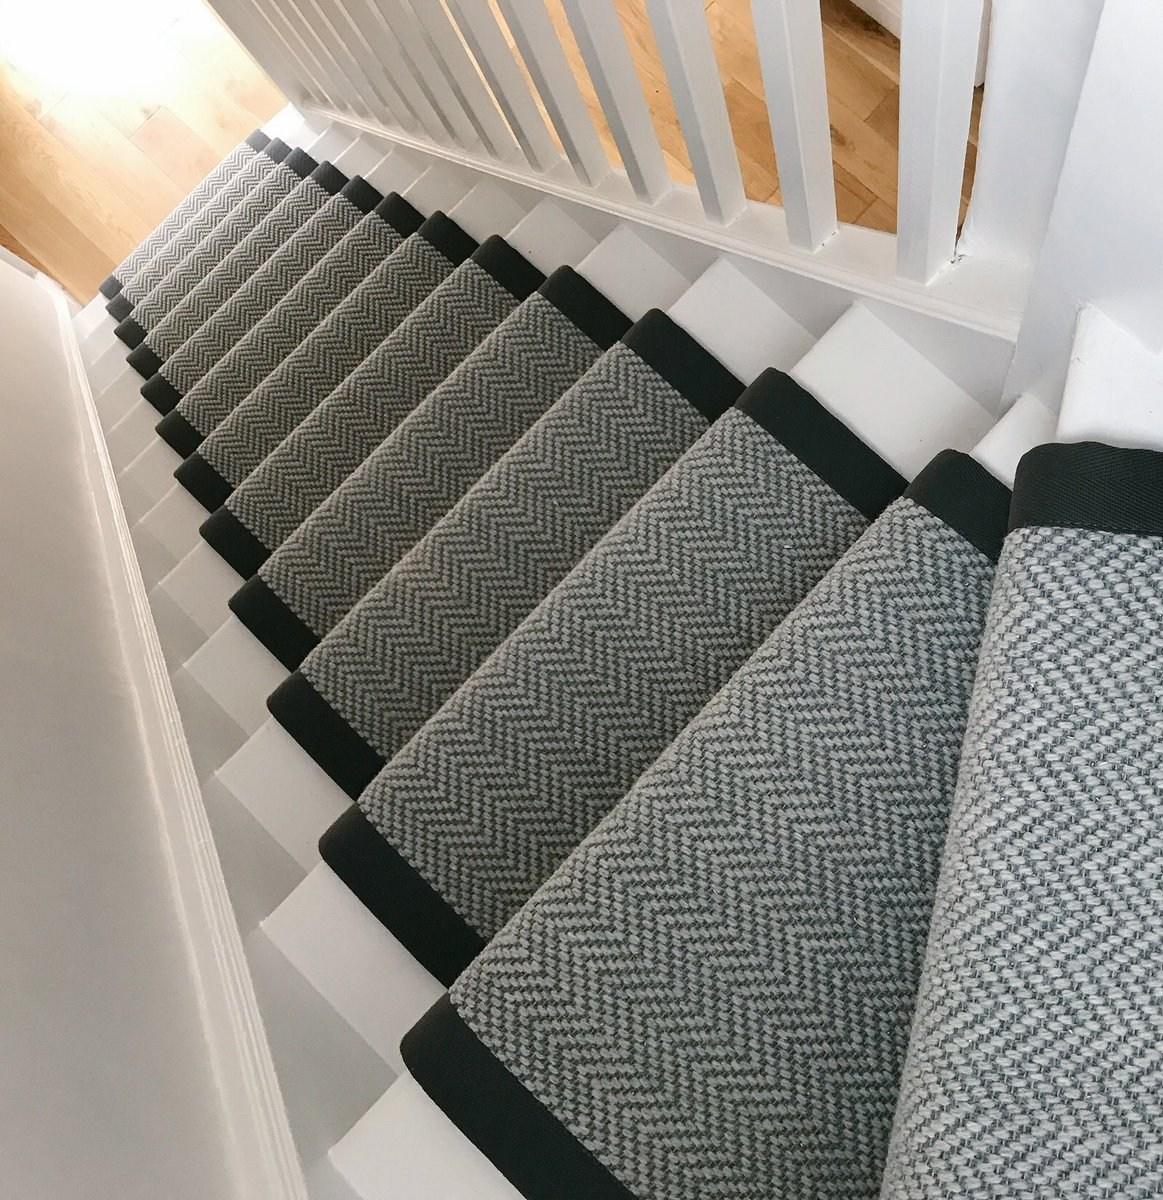 Woven Woods On Twitter Our Hardwearing Herringbone Grey | Grey Herringbone Carpet Stairs | Antelope | Victorian | Middle Stair | Roger Oates | Blue